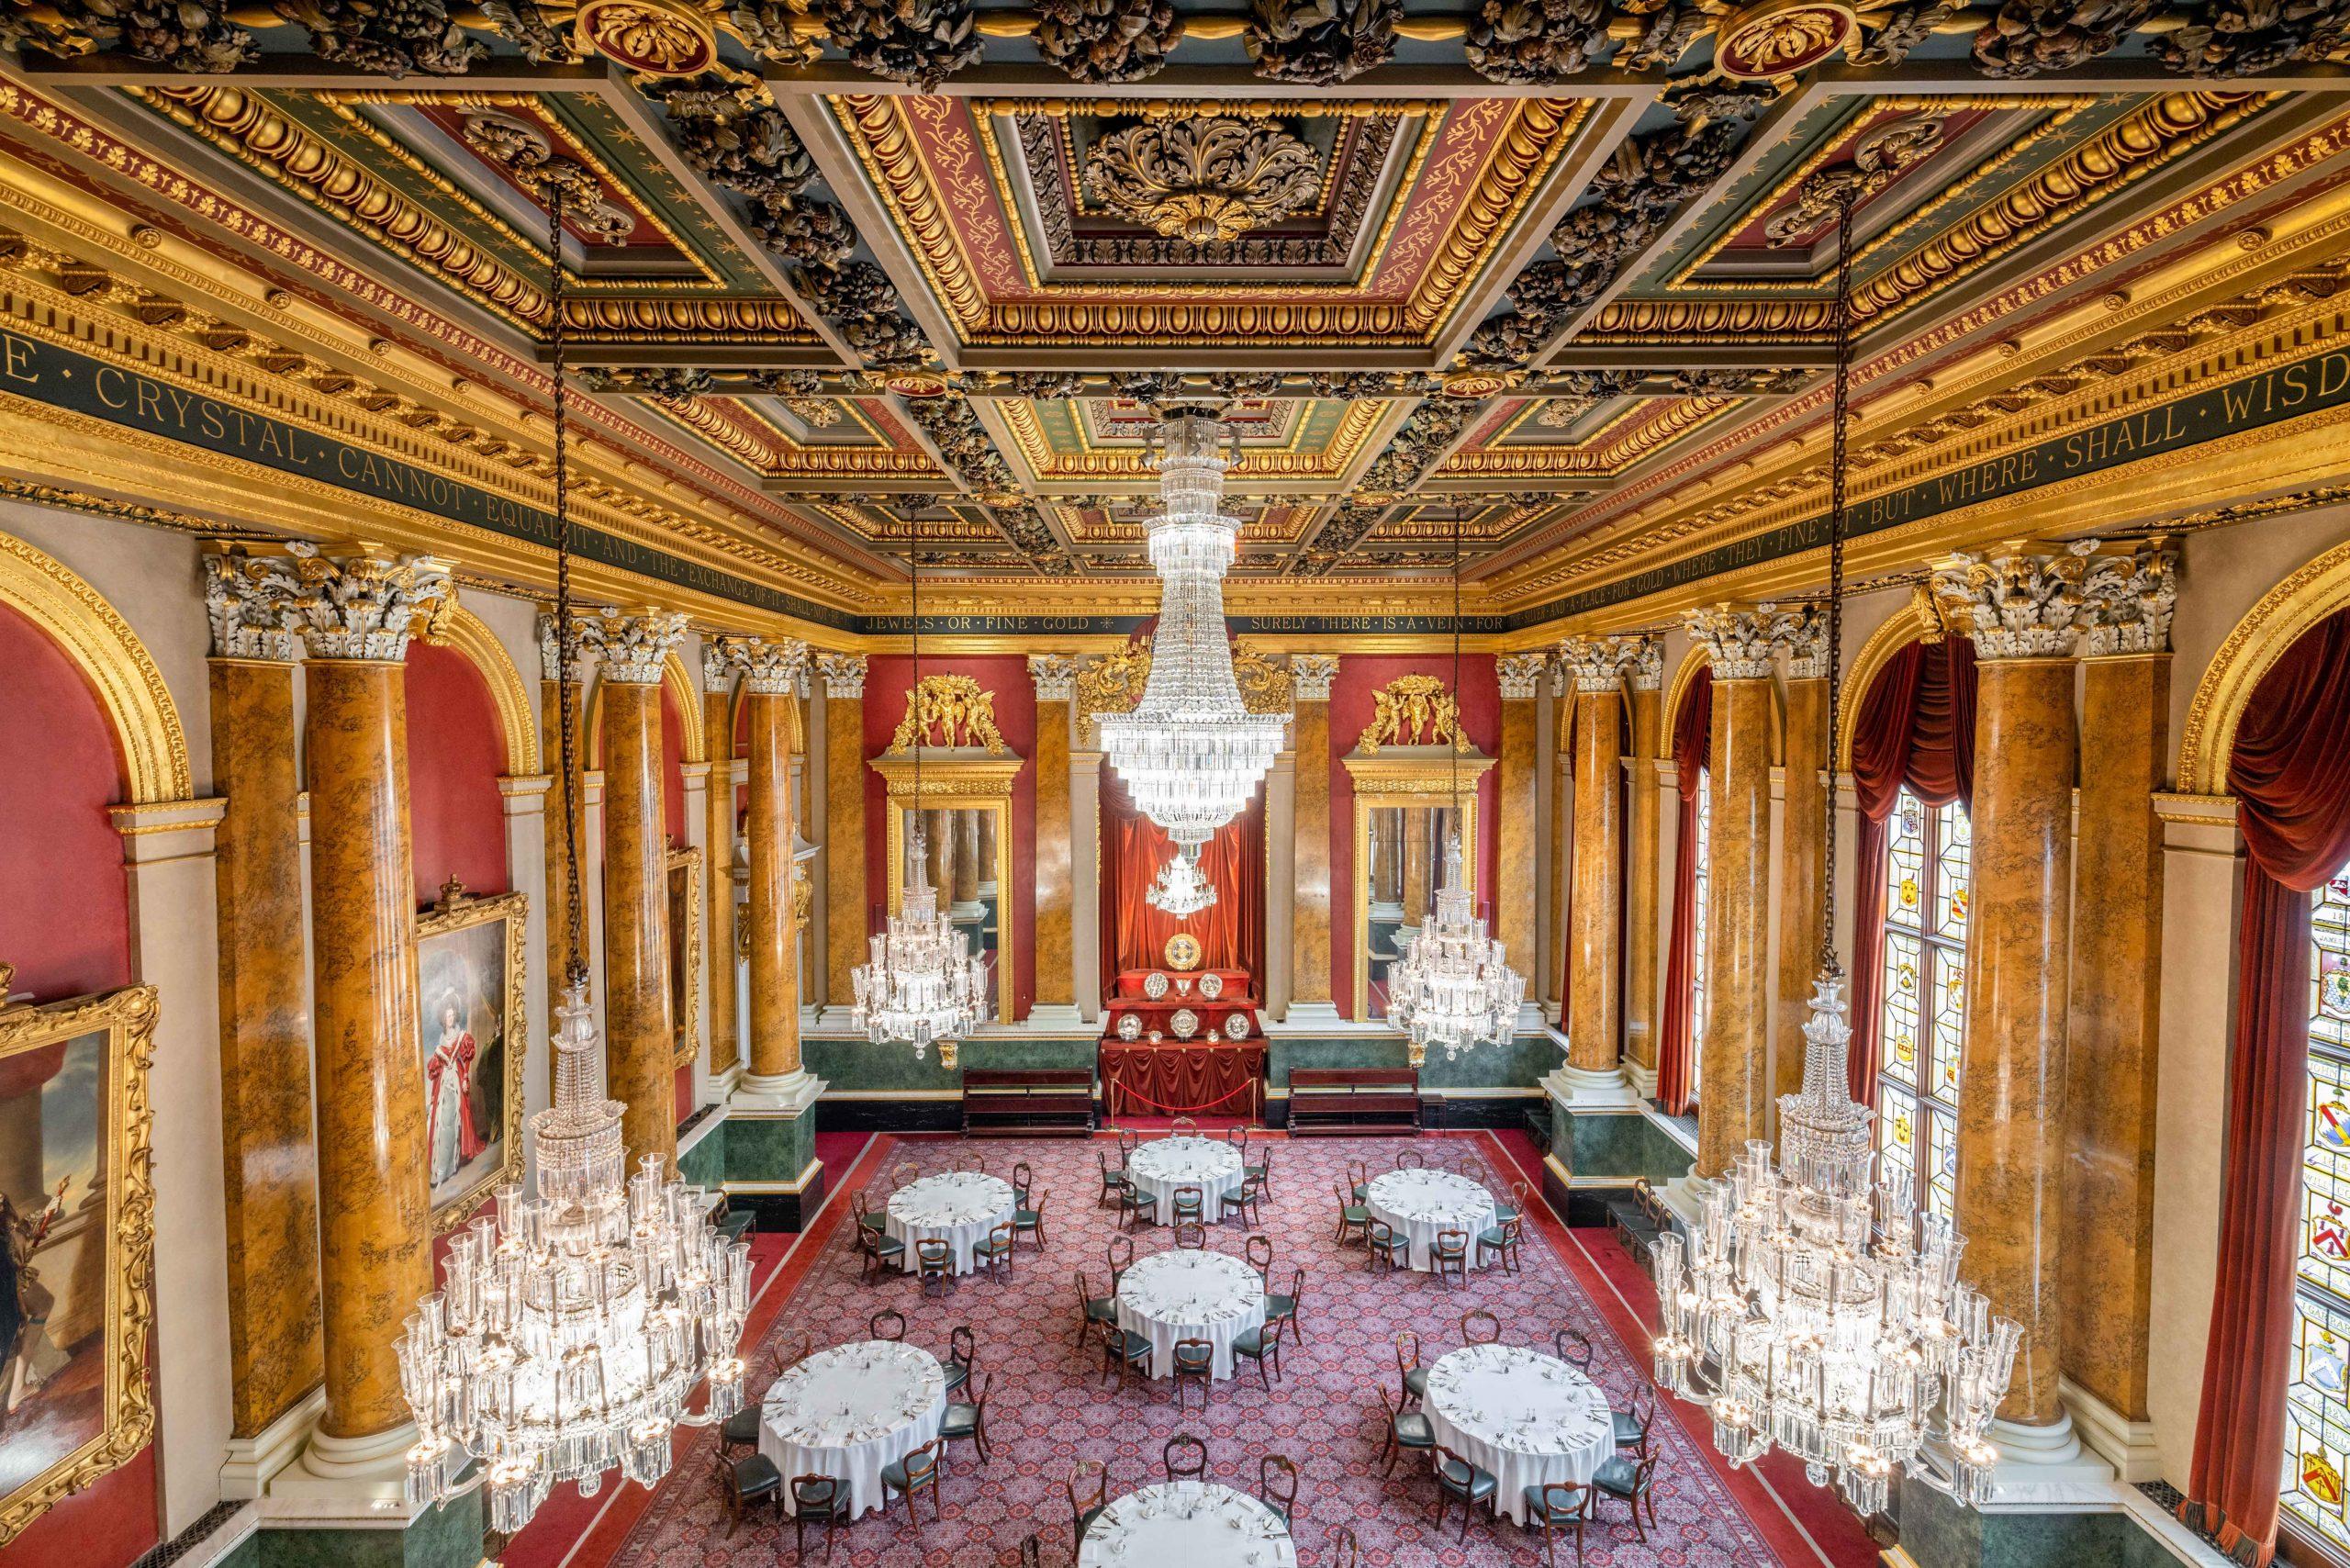 Grand london venue goldsmith's hall